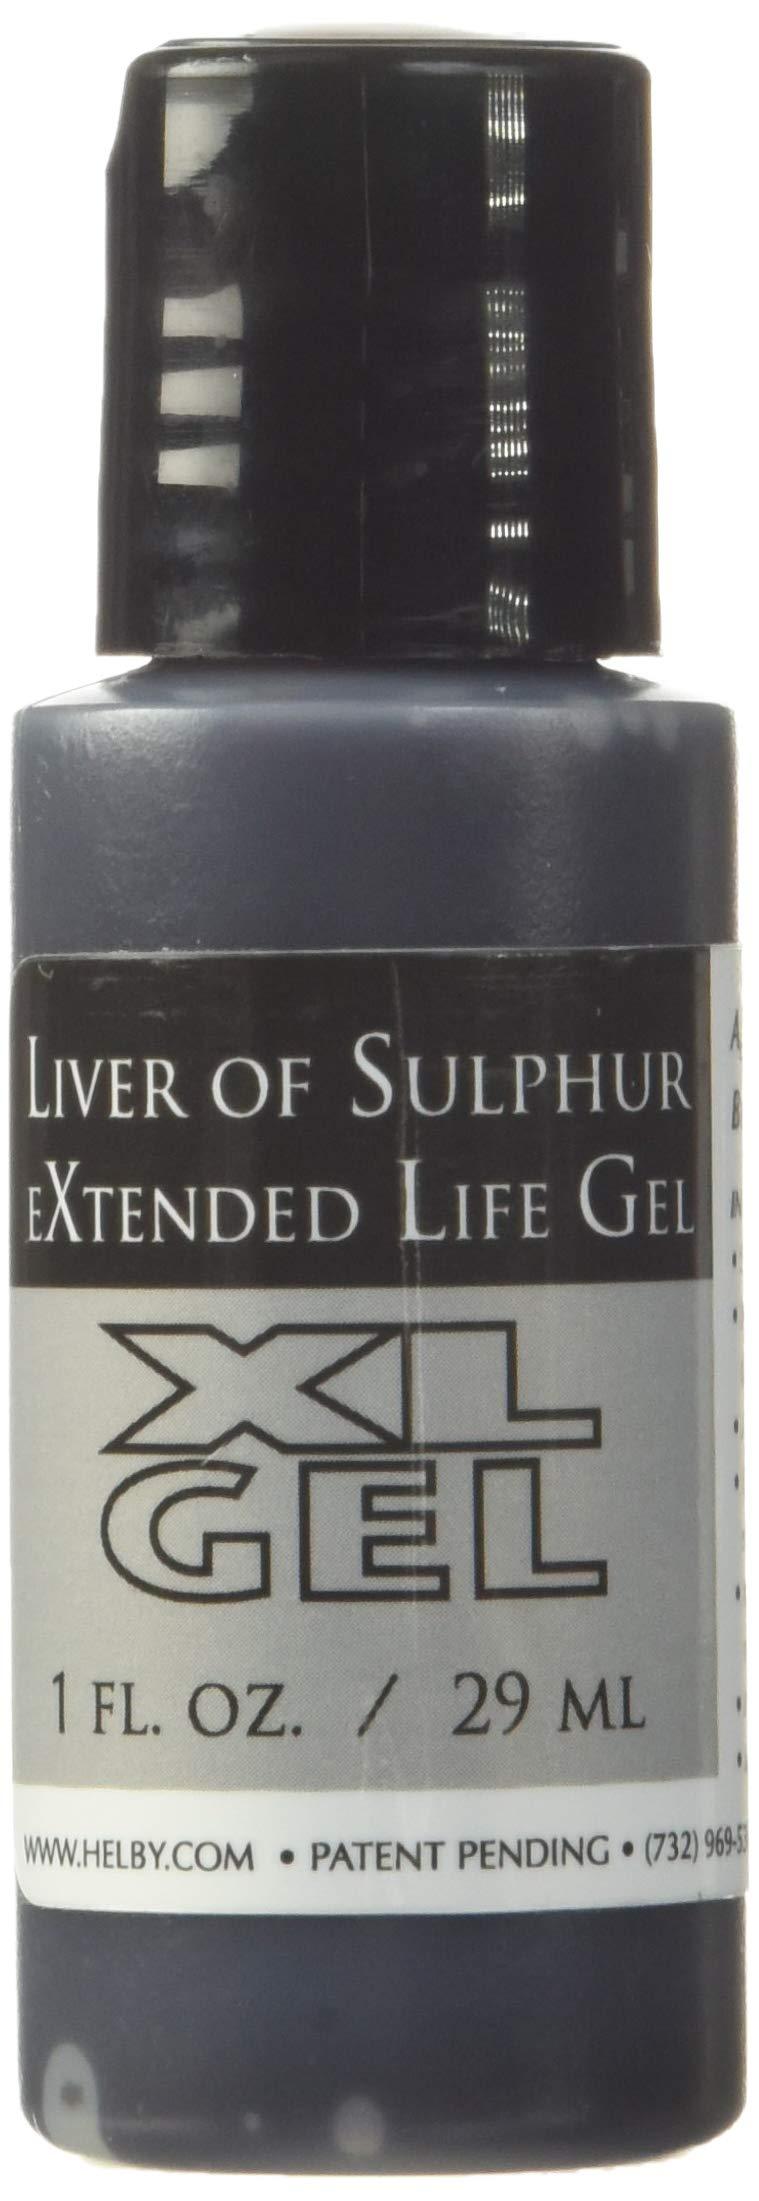 Liver of Sulphur Gel, 1 Ounce Bottle | SOL-610.01